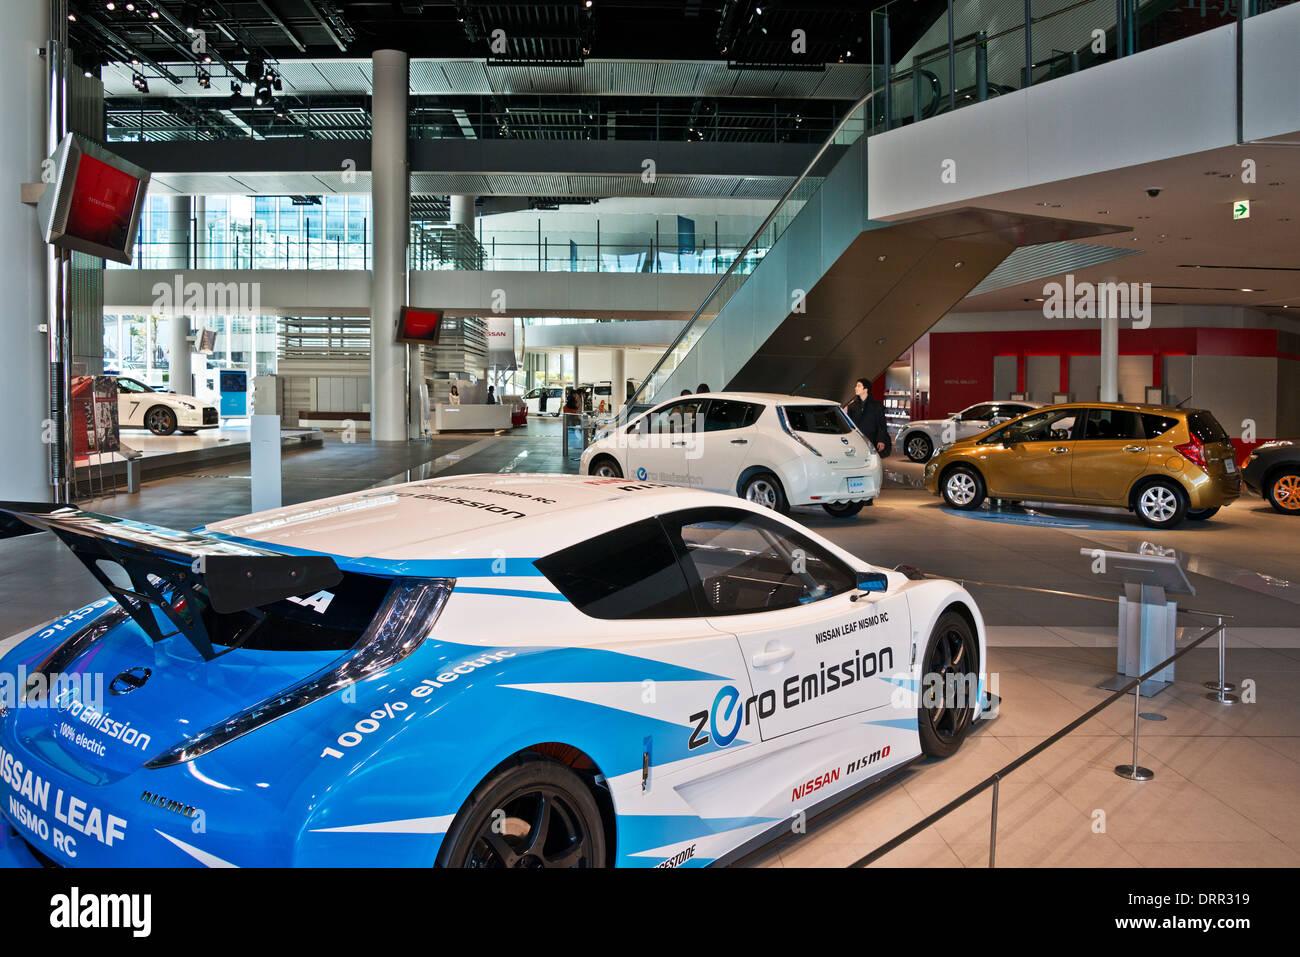 Nissan Gallery, Global Headquarters, Yokohama, Japan - Stock Image